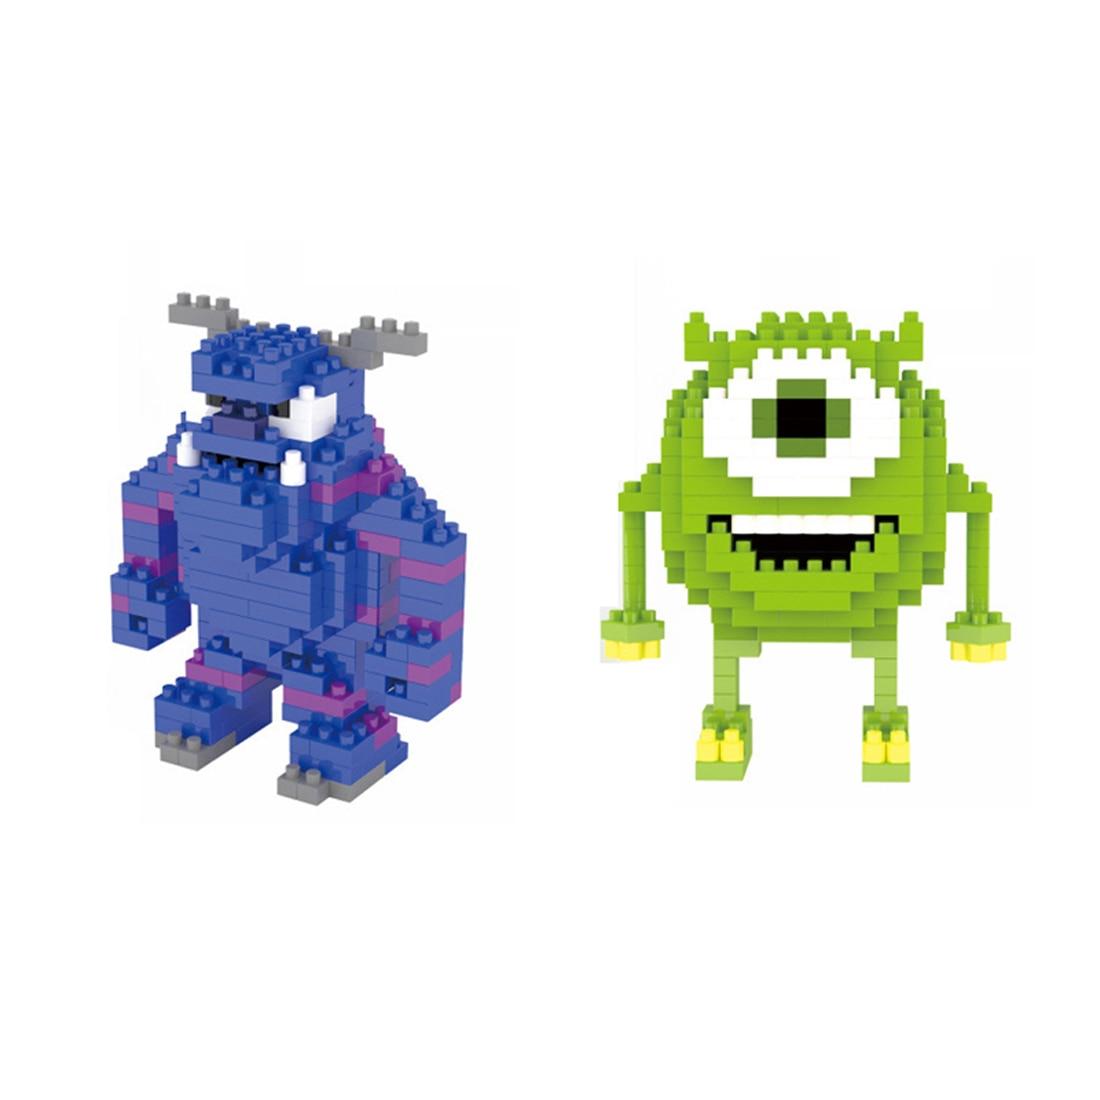 Lepining quente clássico criadores monstros desenhos animados transportando mr q mike michael wazowski mini micro diamante bloco tijolos brinquedos presente